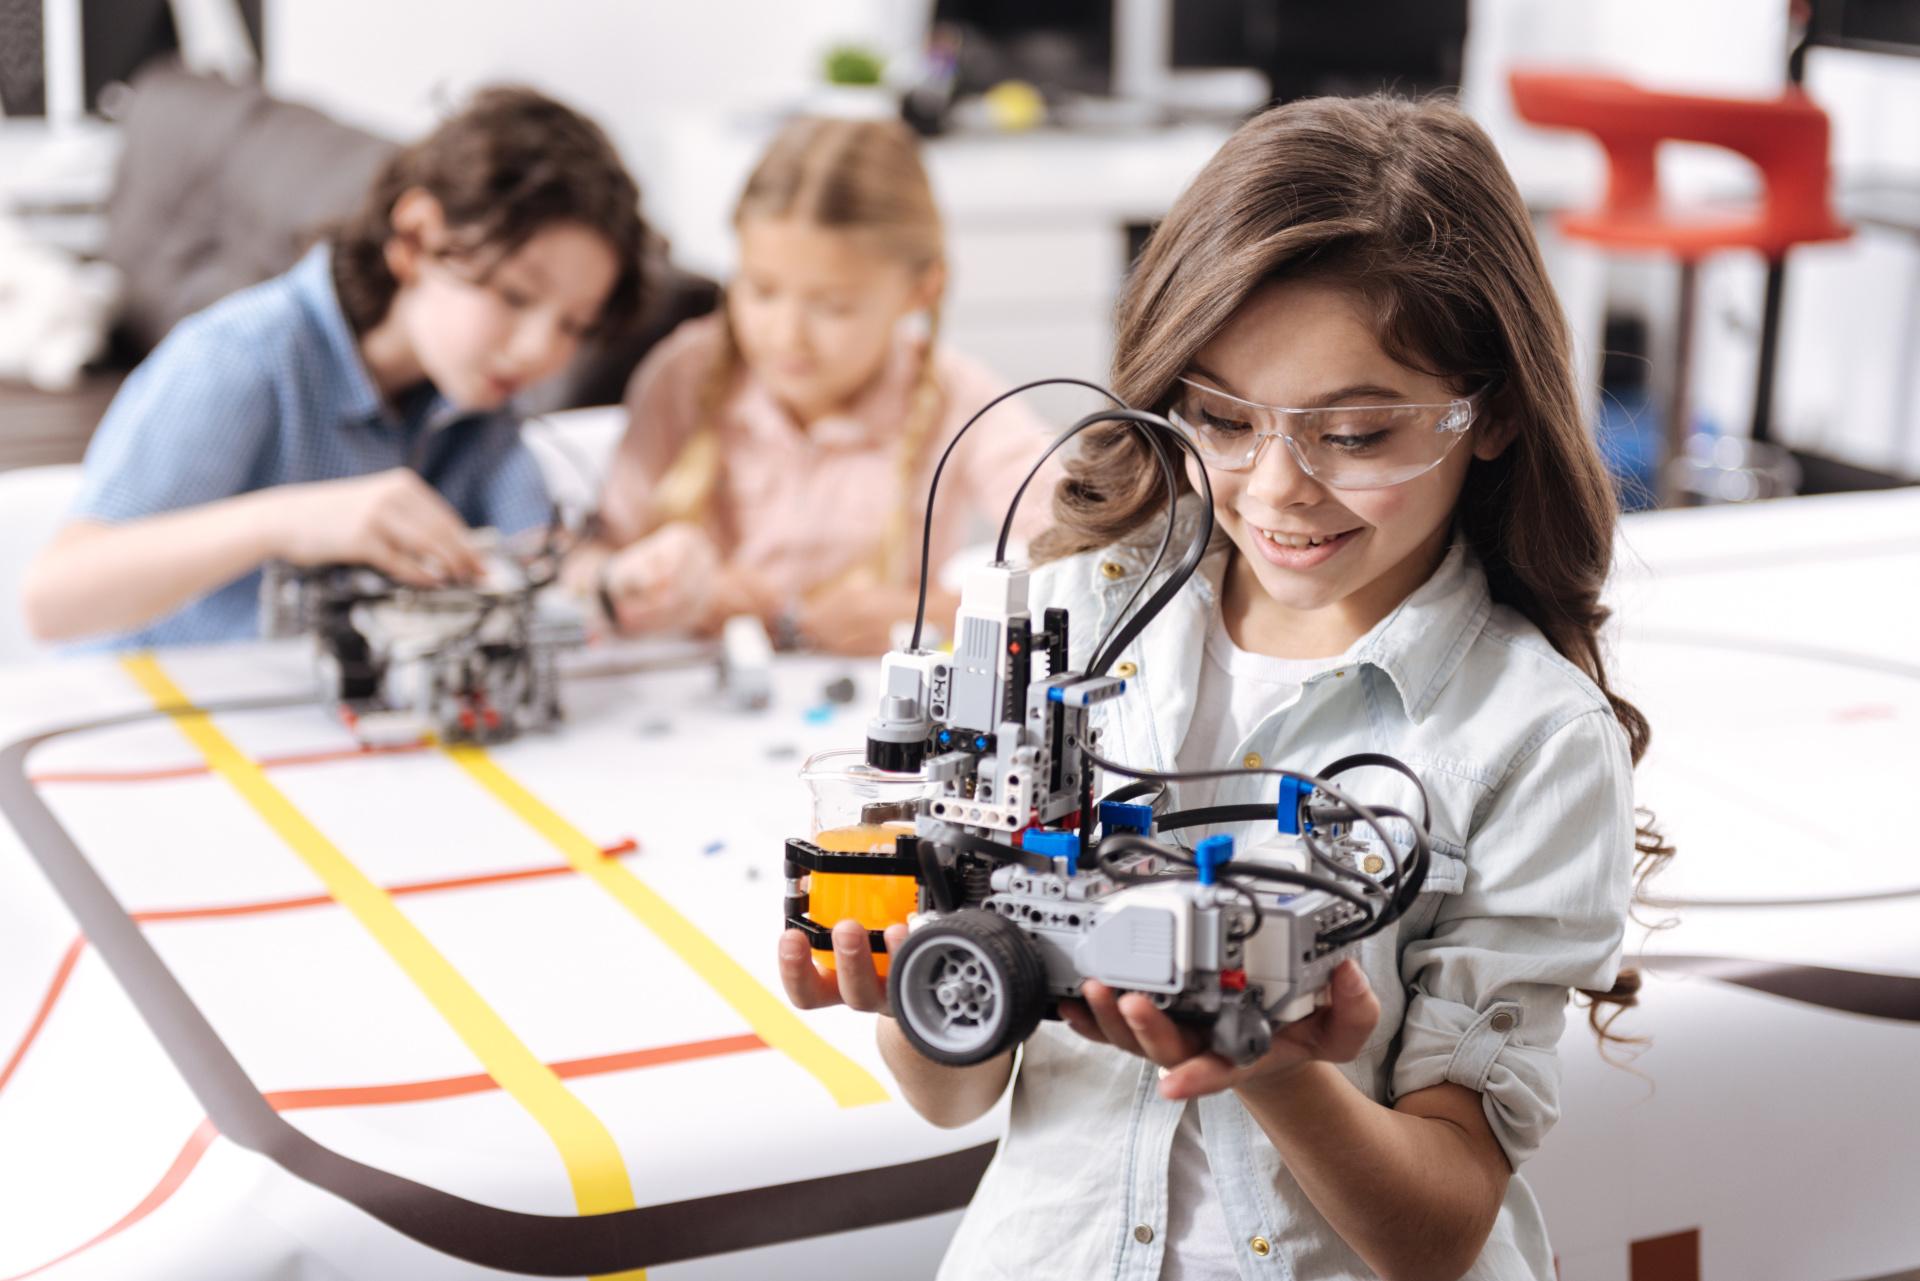 Rbotics for Kids | STEM Builders ROBOTICS & Math Learning Center